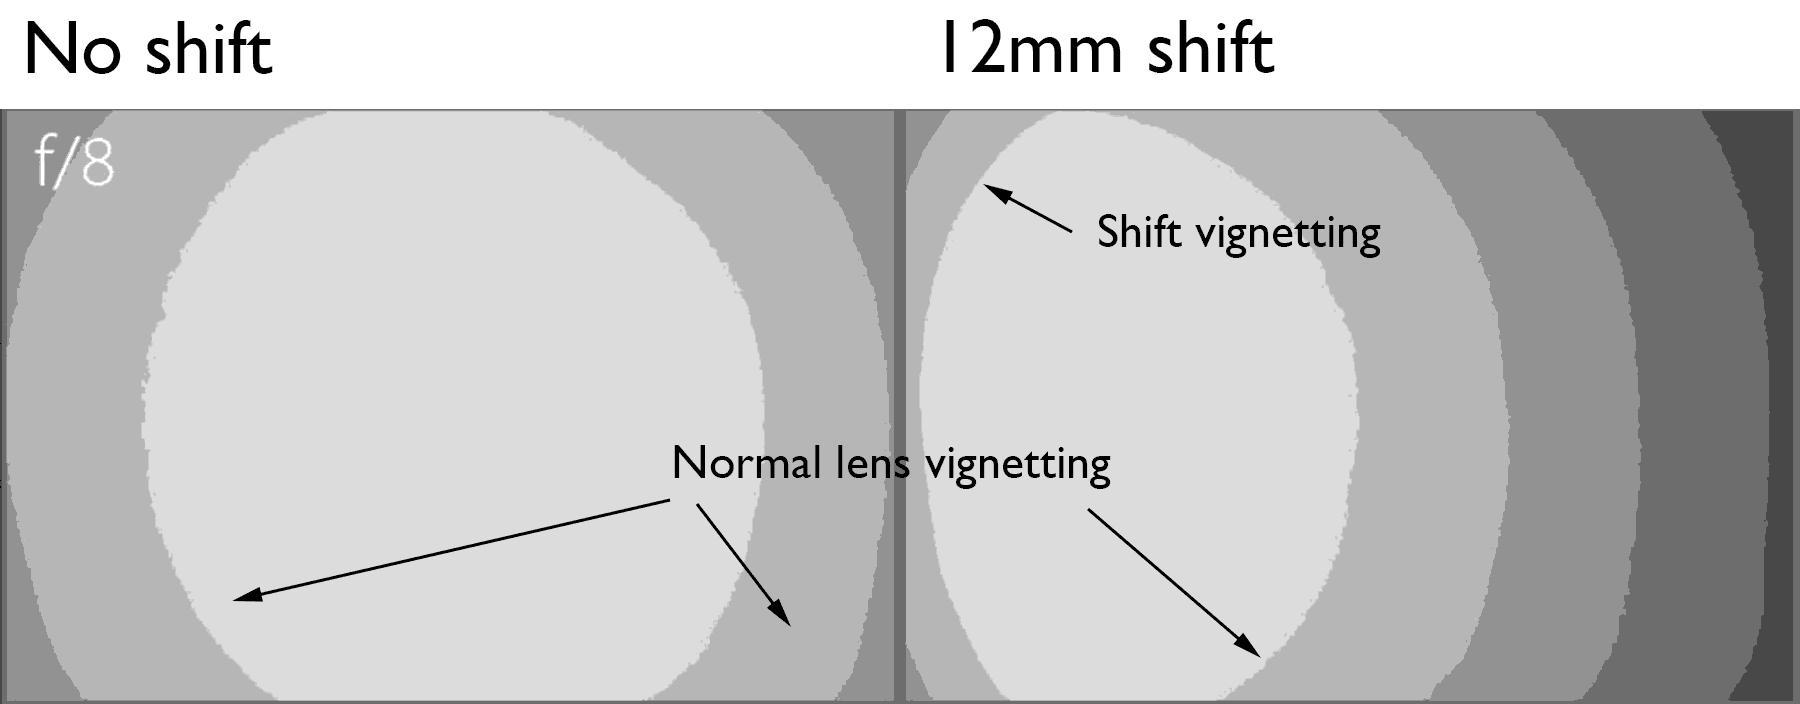 shift-vignetting